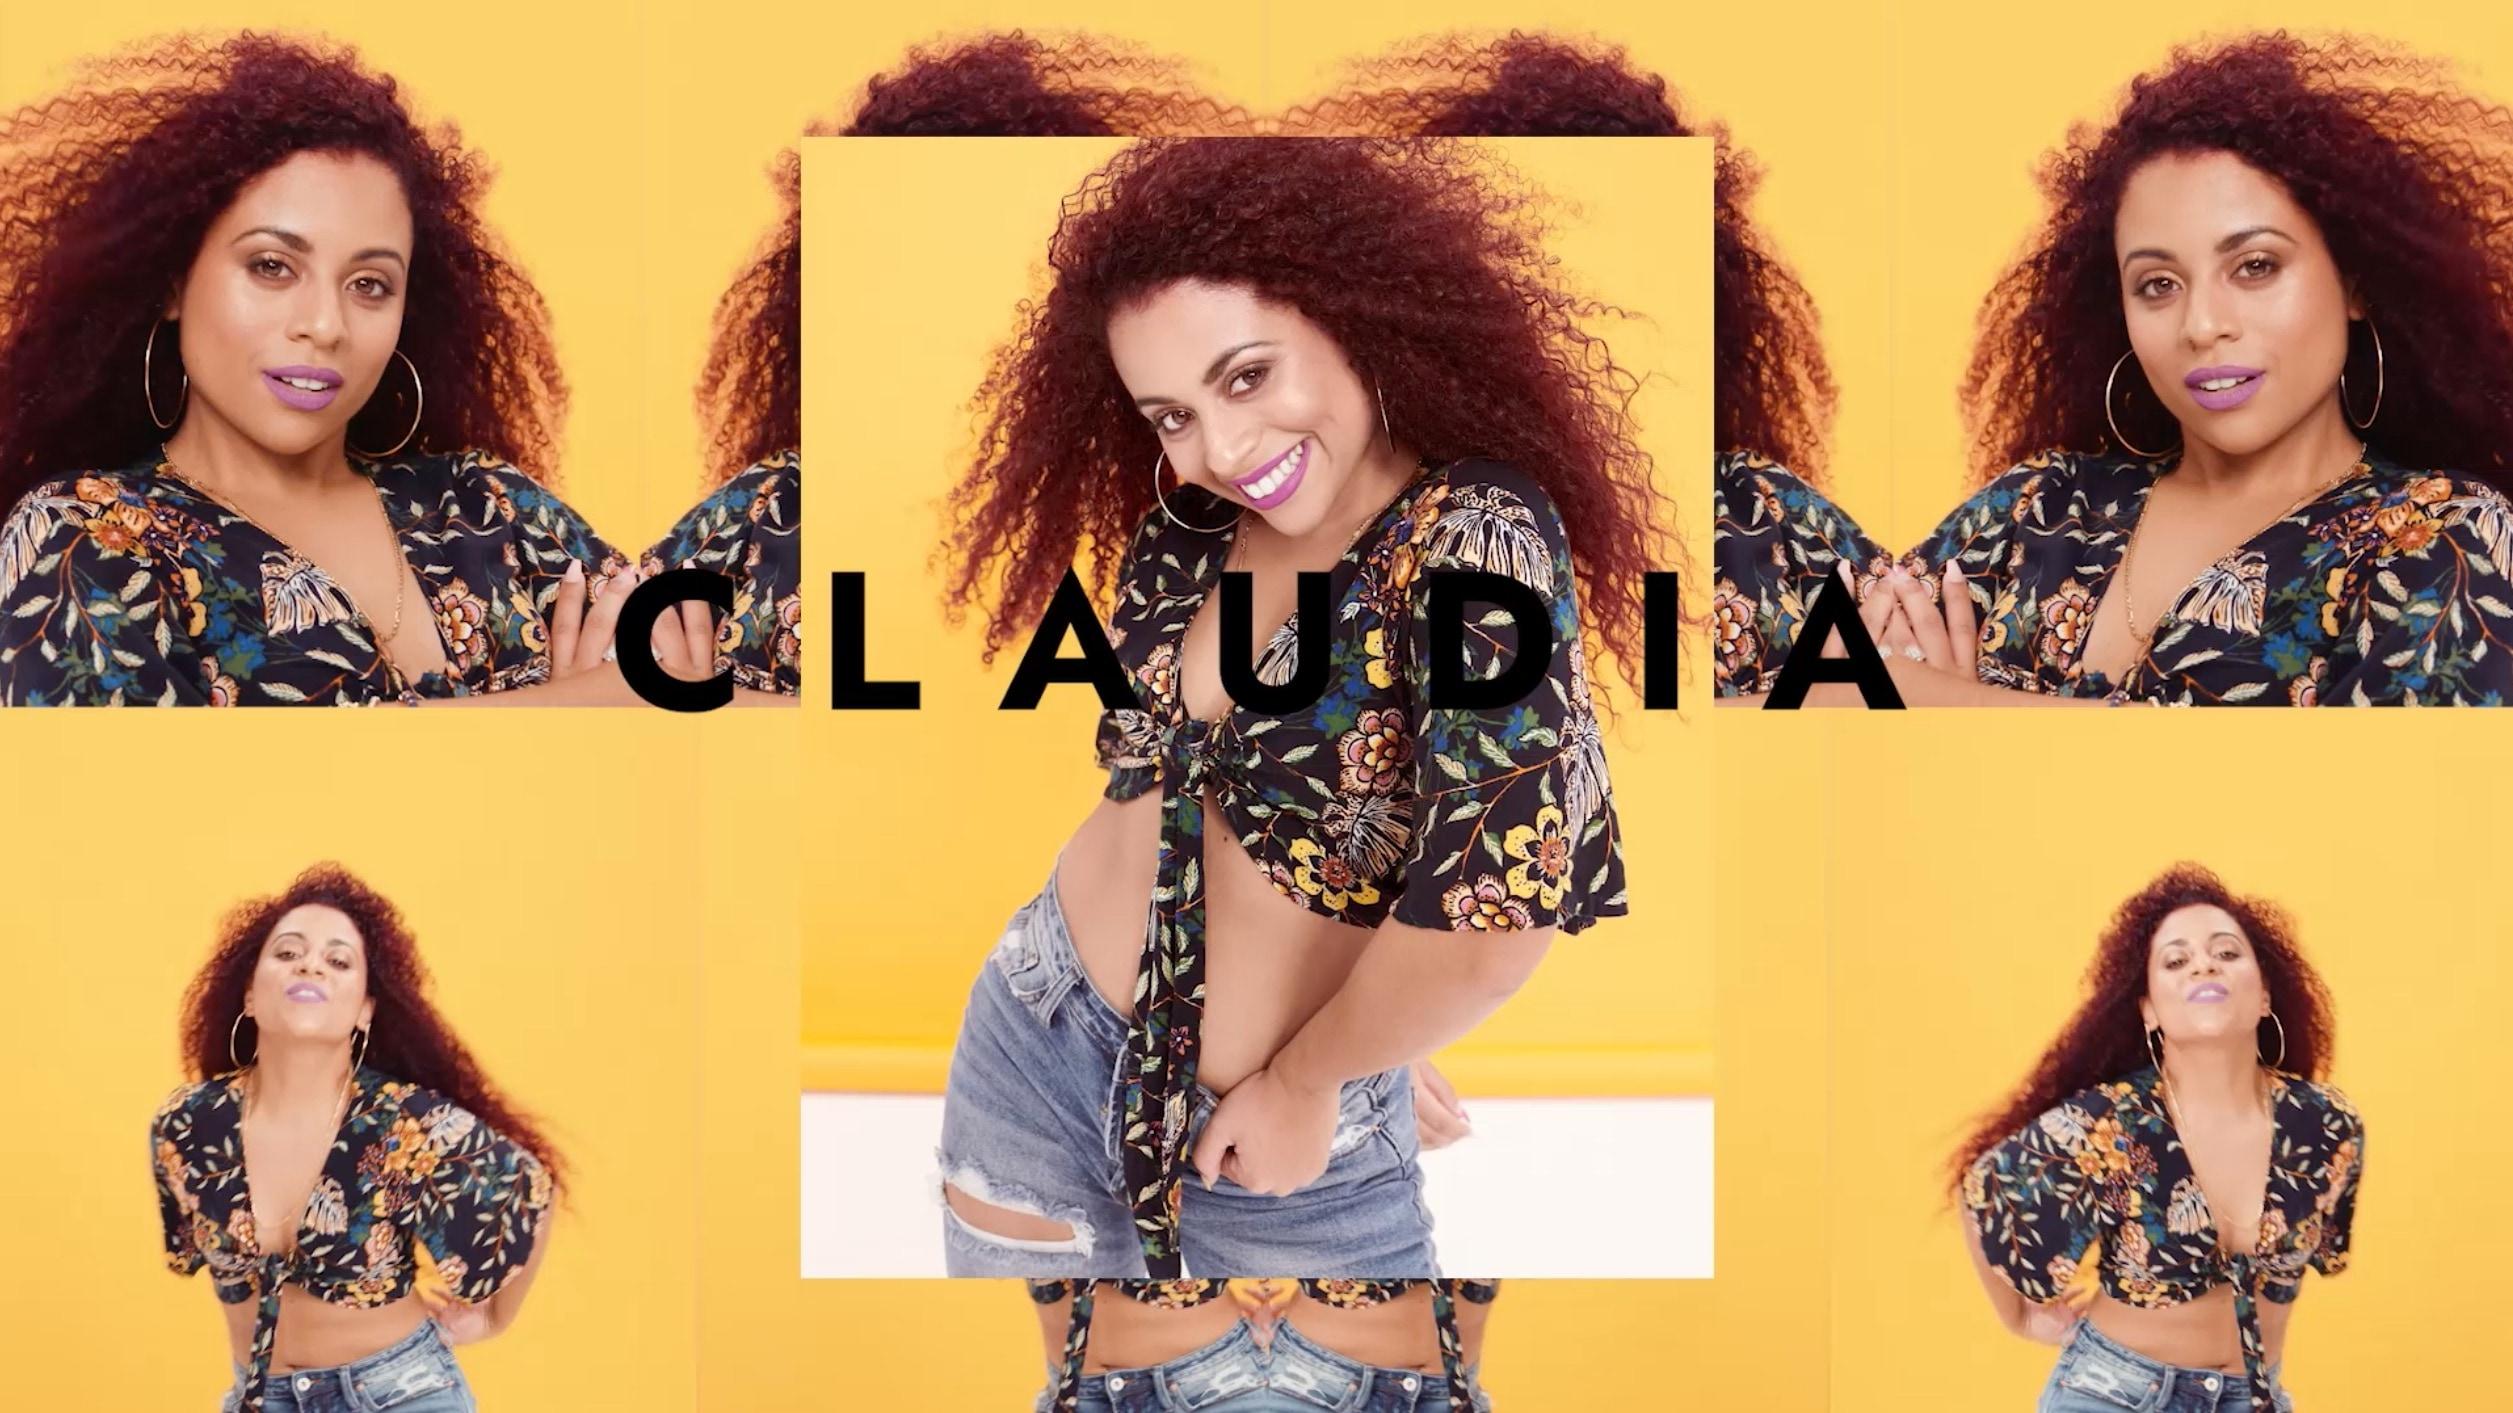 Watch Claudia discuss Hispanic Heritage Month